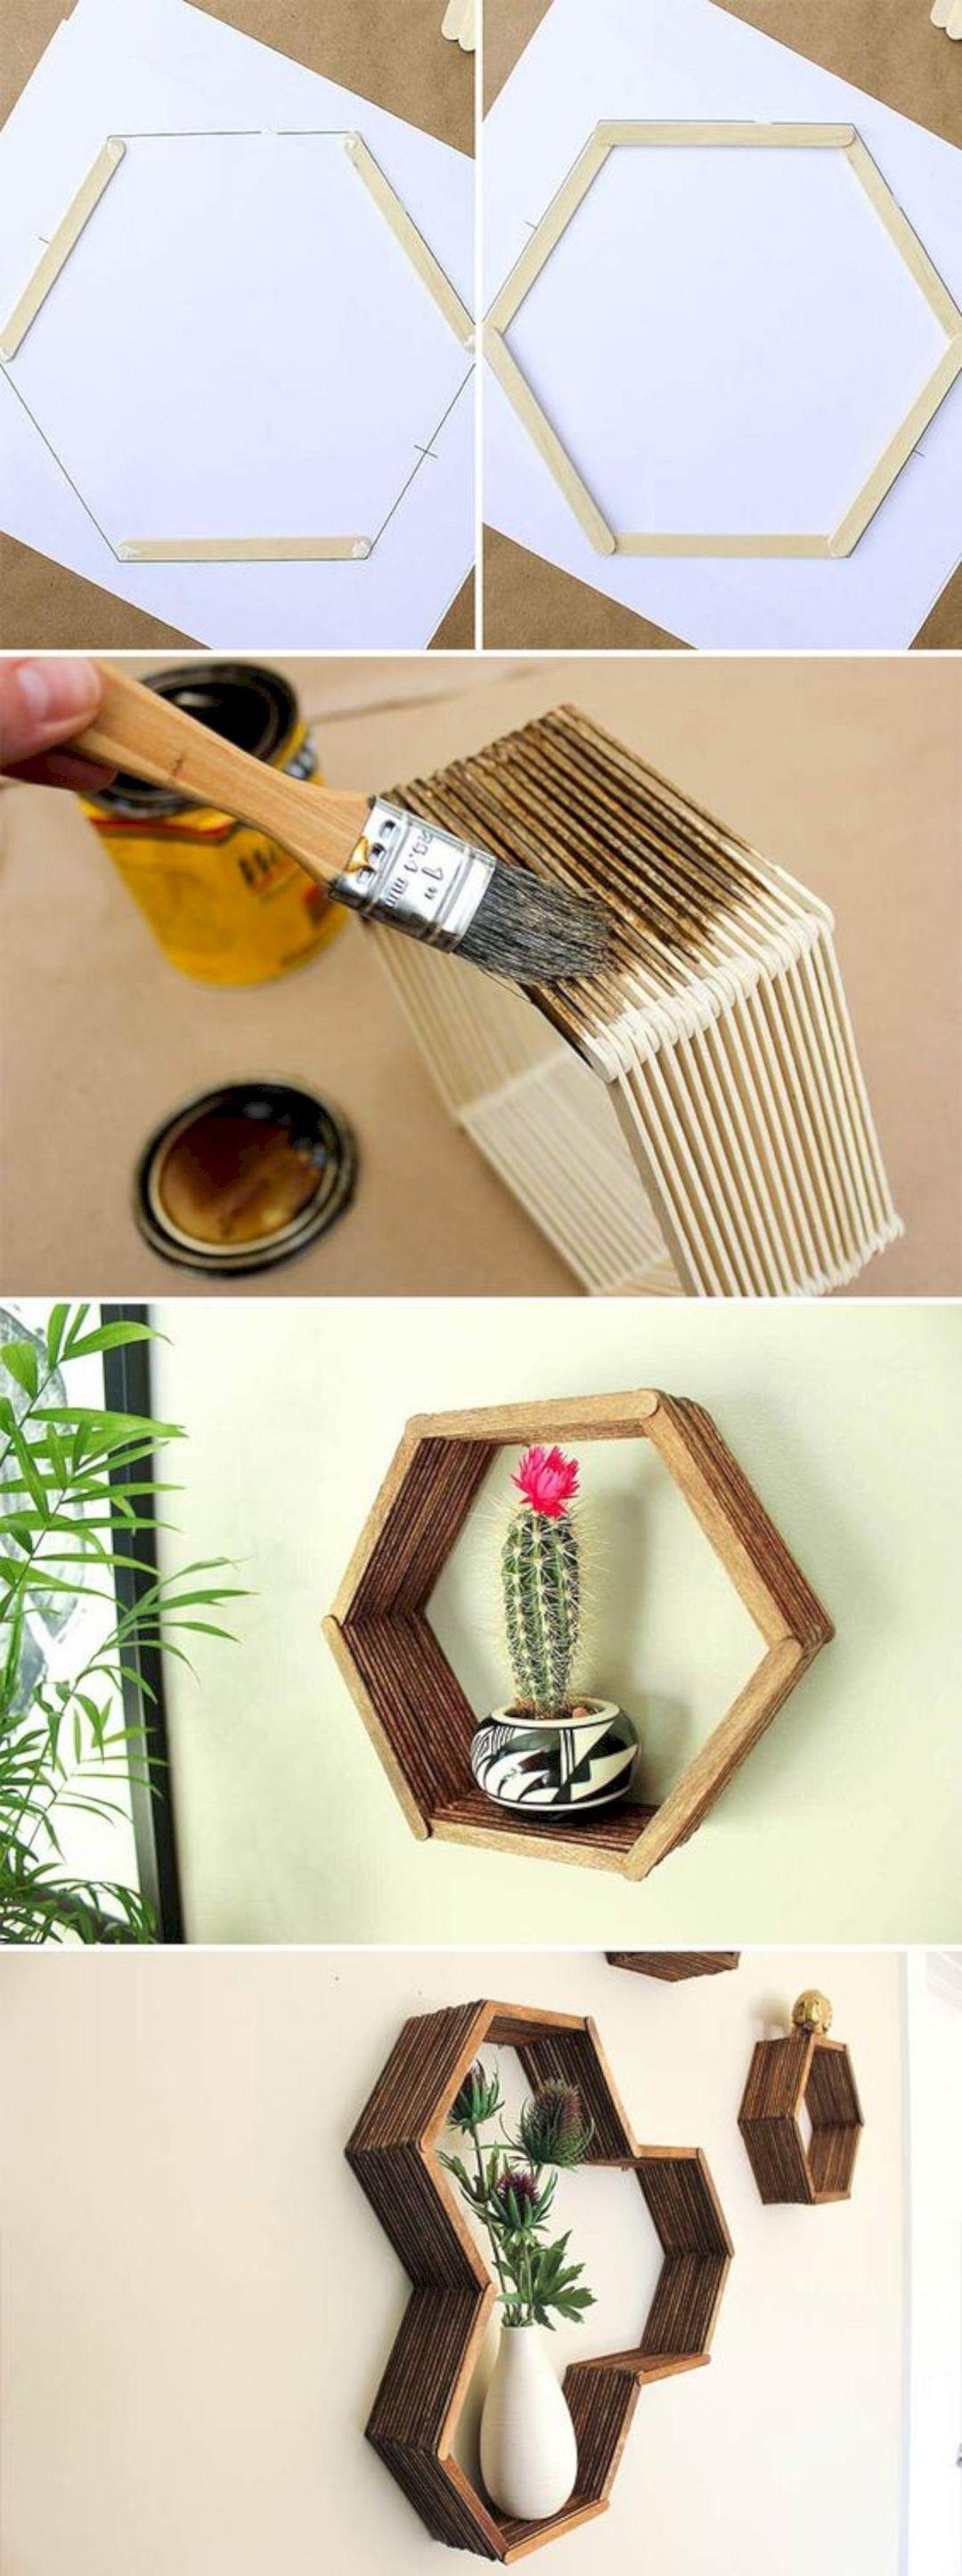 Get Best DIY Home Decor from futuristarchitecture.com